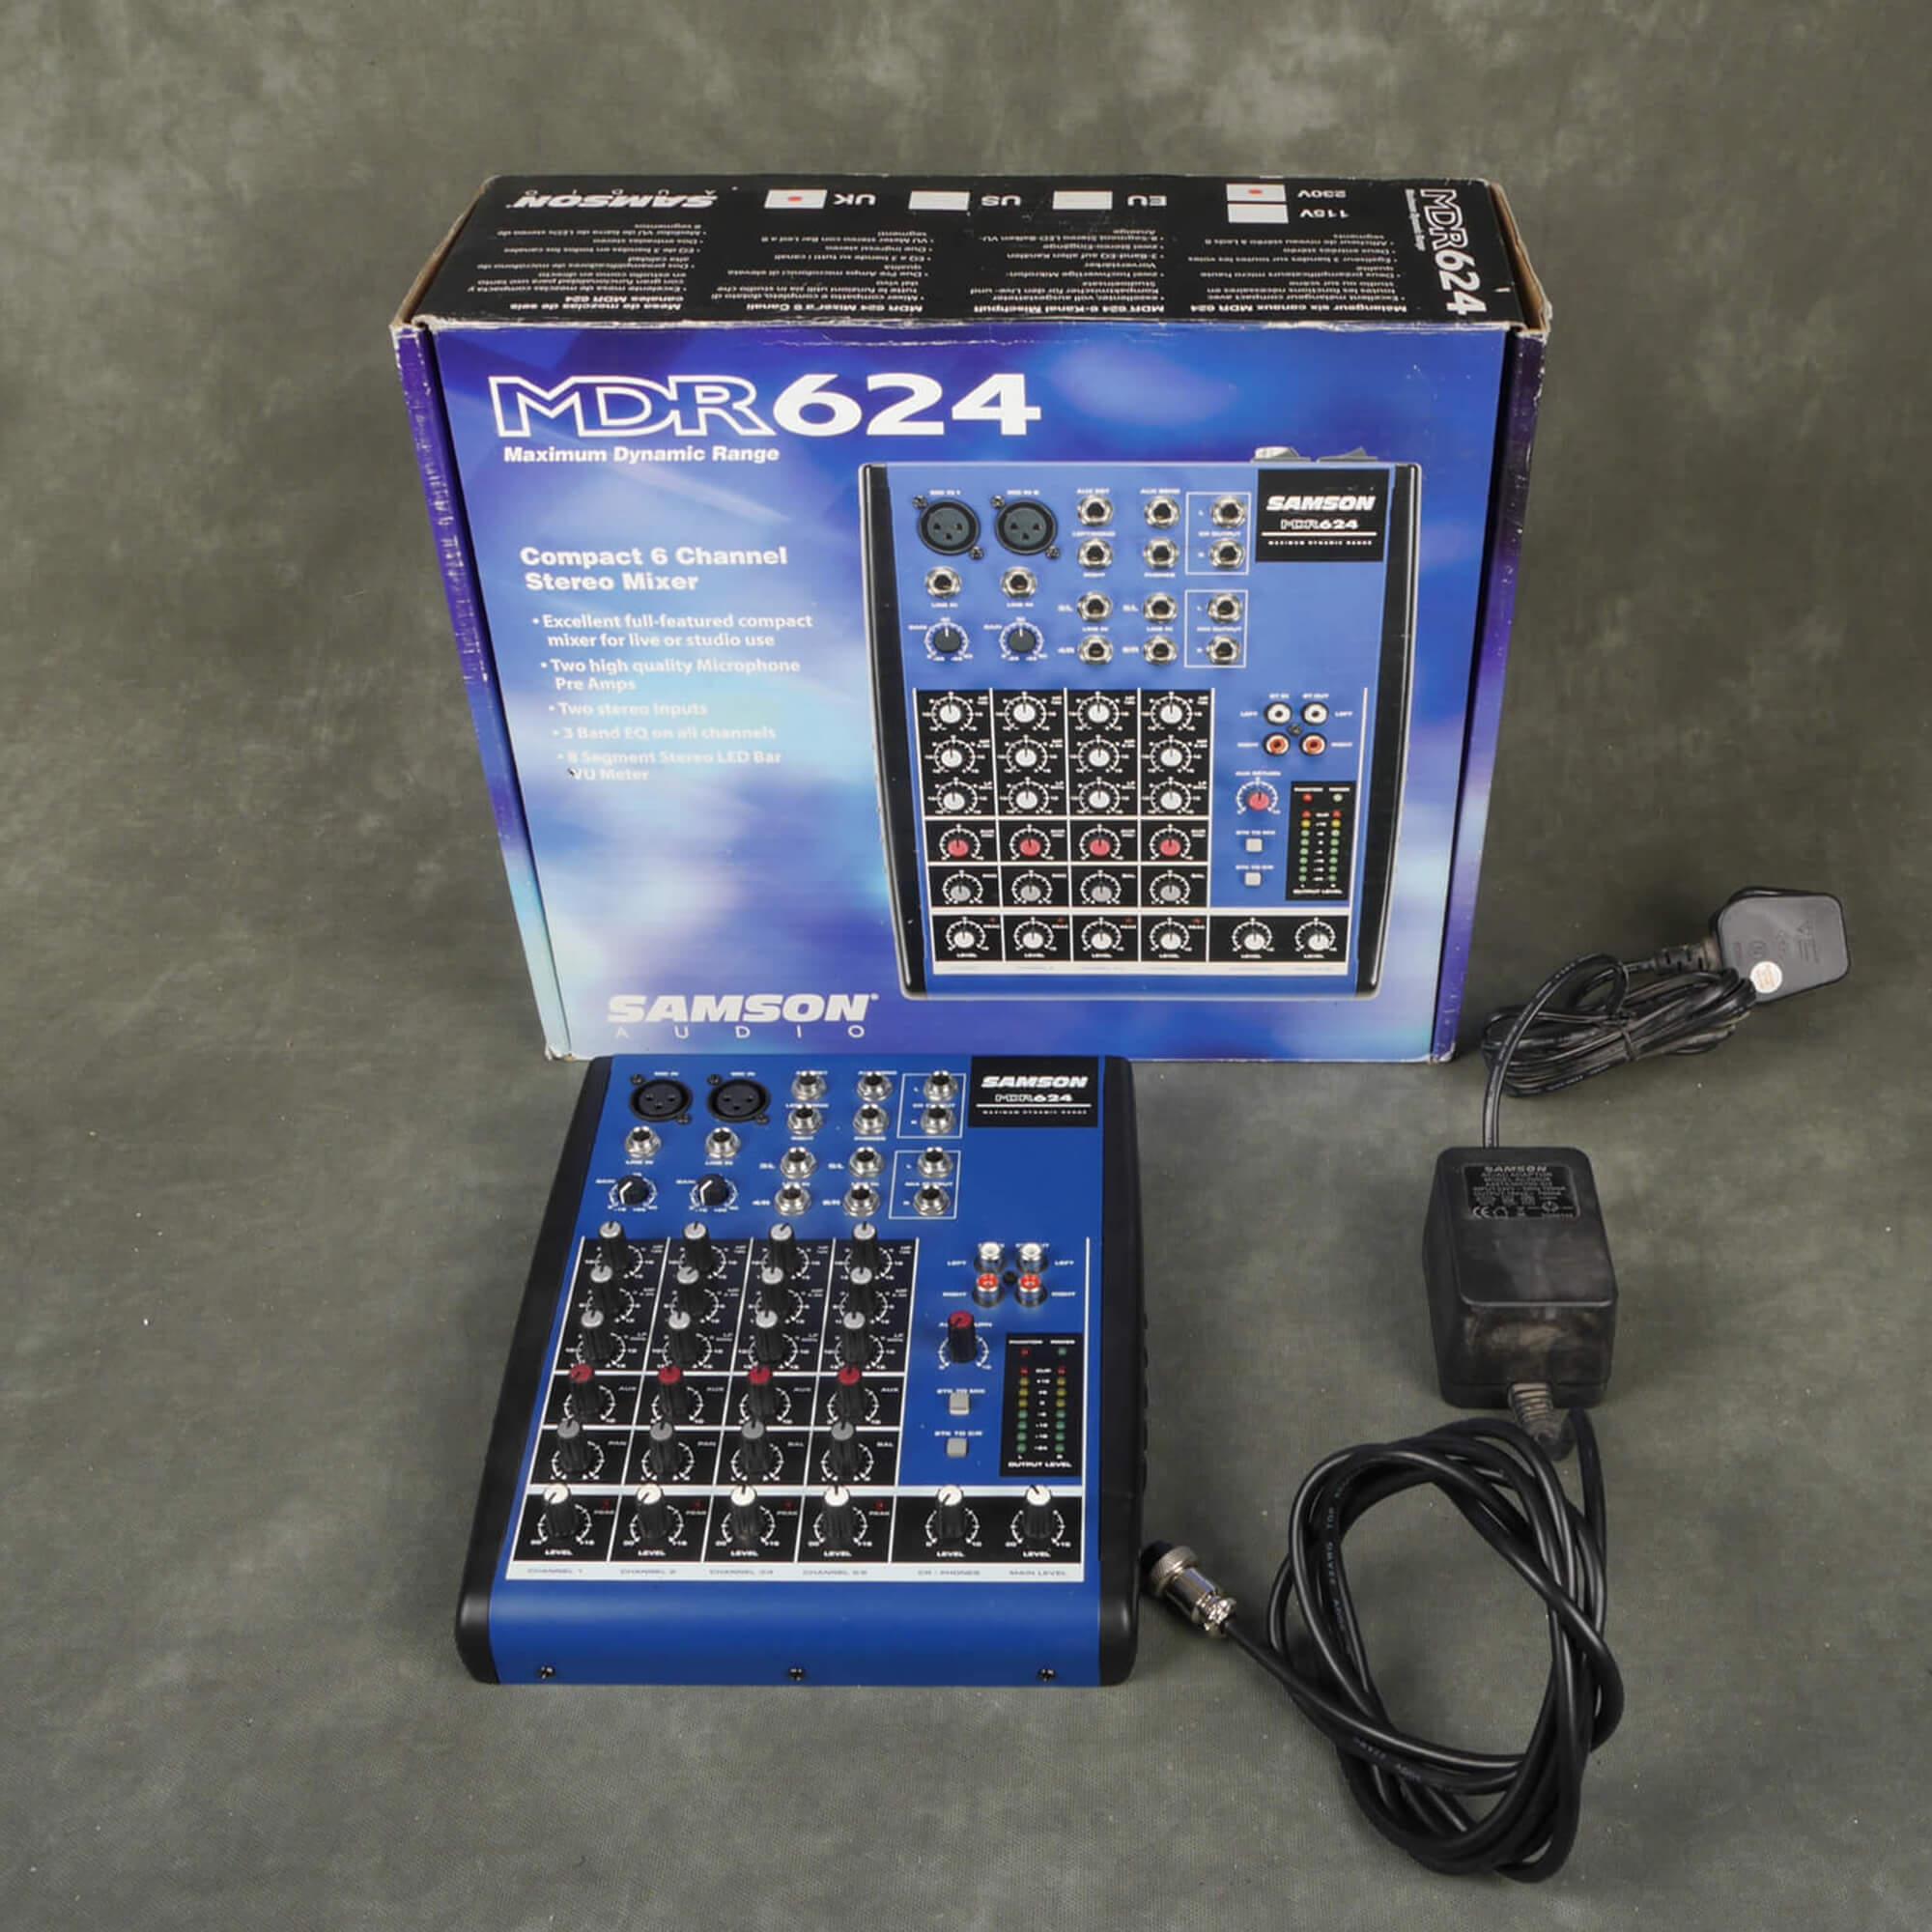 Samson MDR624 Mixer w/Box & PSU - 2nd Hand